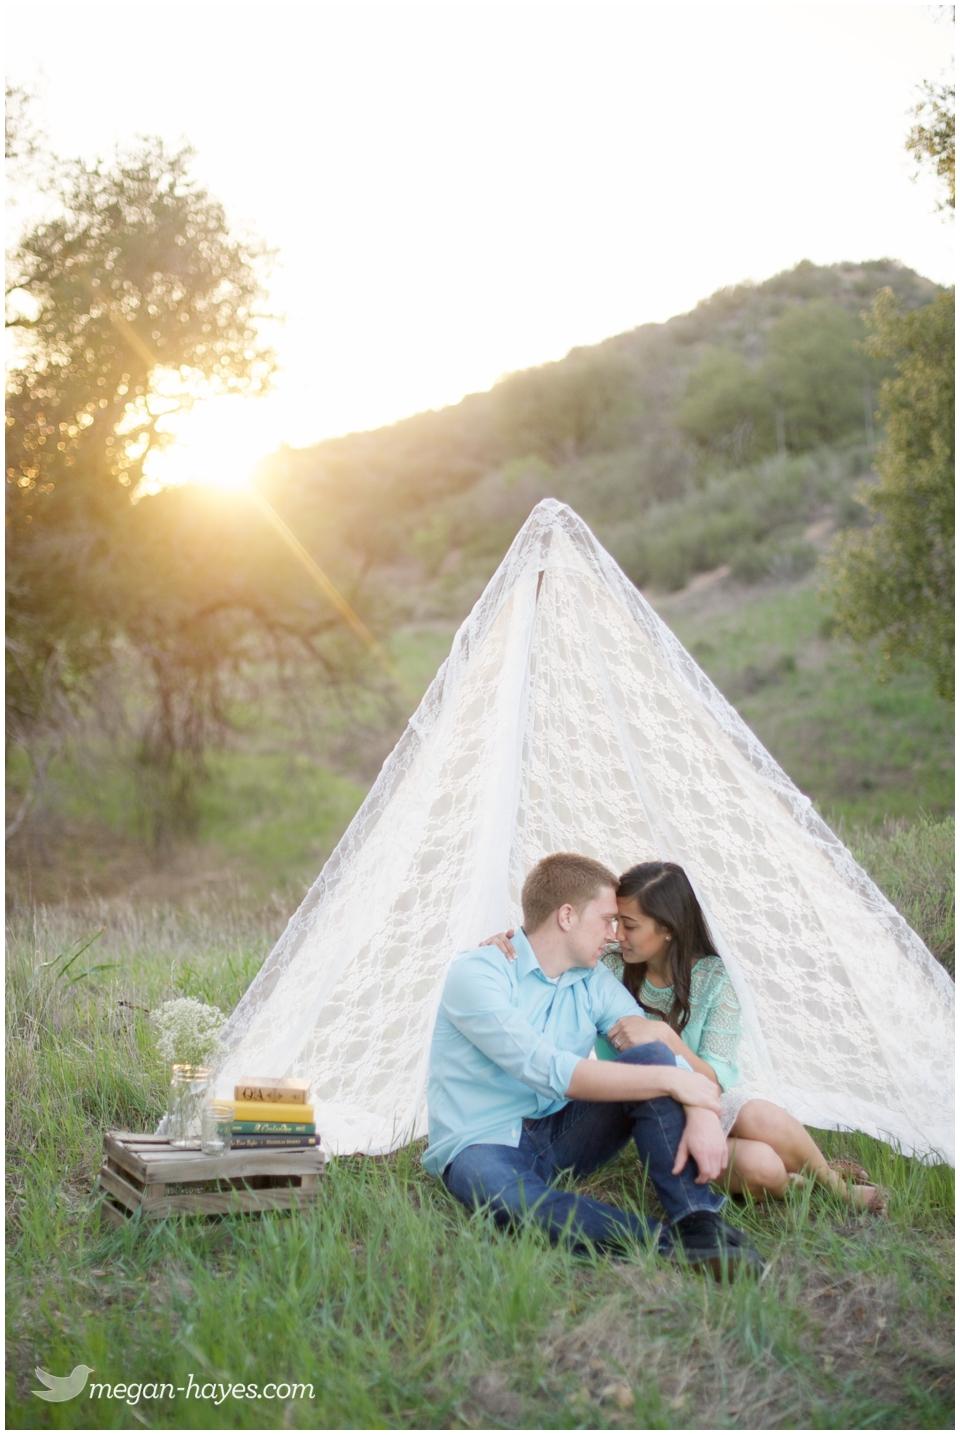 Lace Tent Engagement Session